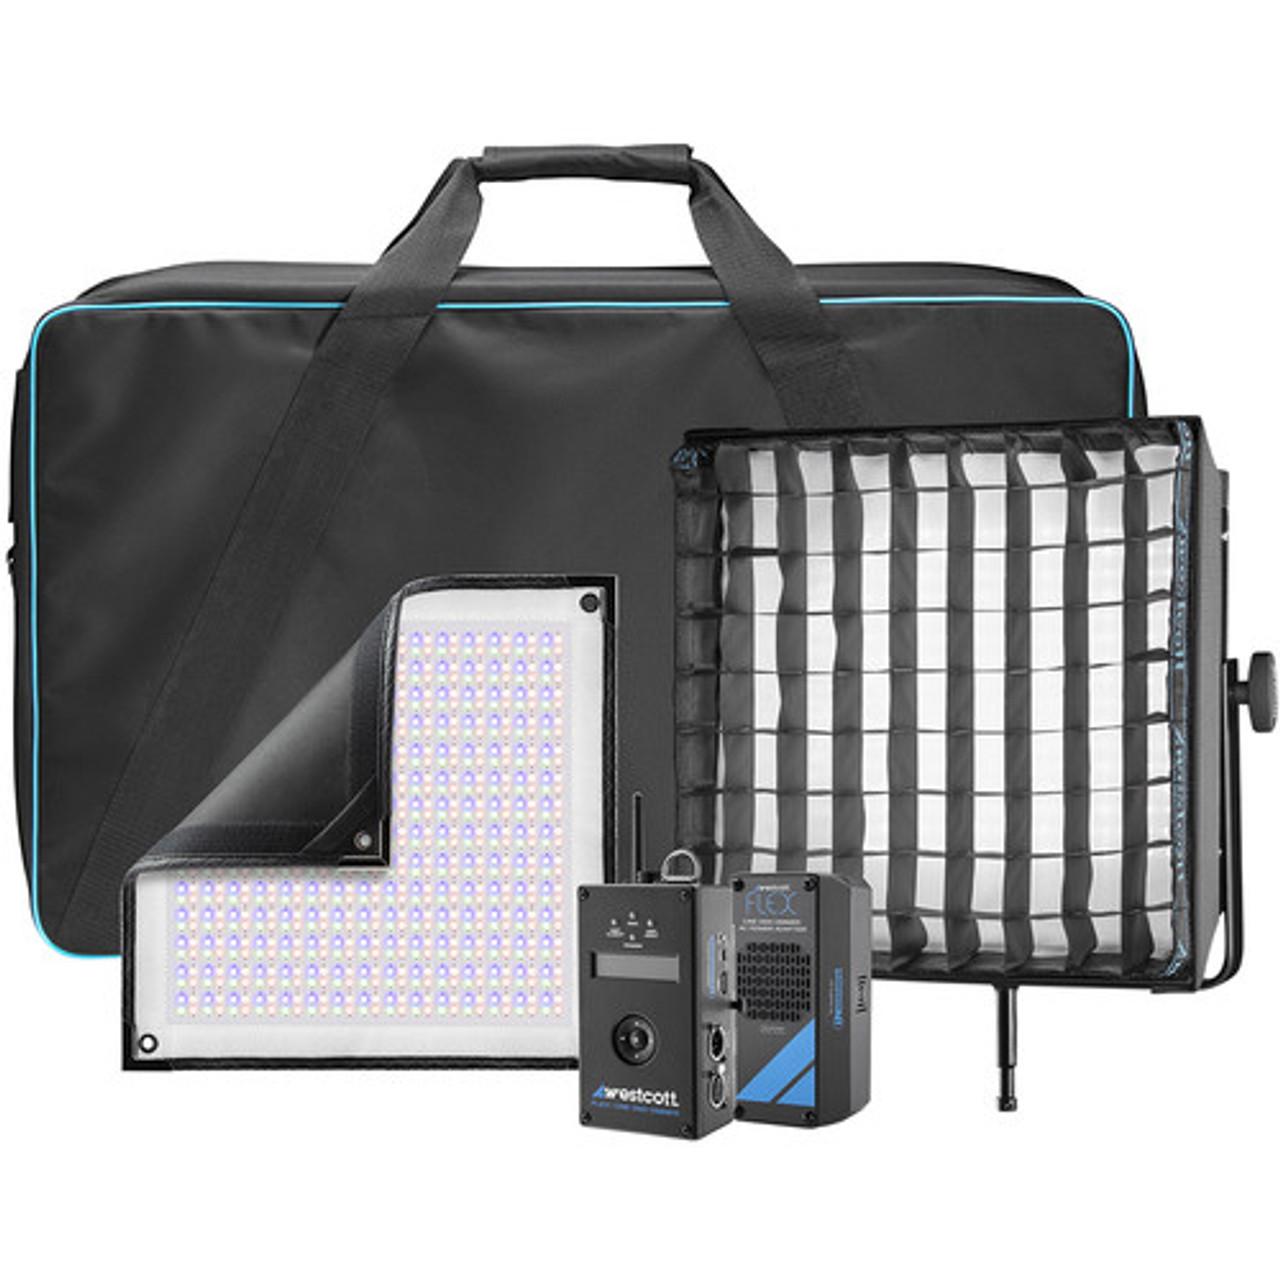 Westcott 7631 Flex Cine DMX RGBW LED Mat Single Light Fixture Kit (1 x 1')